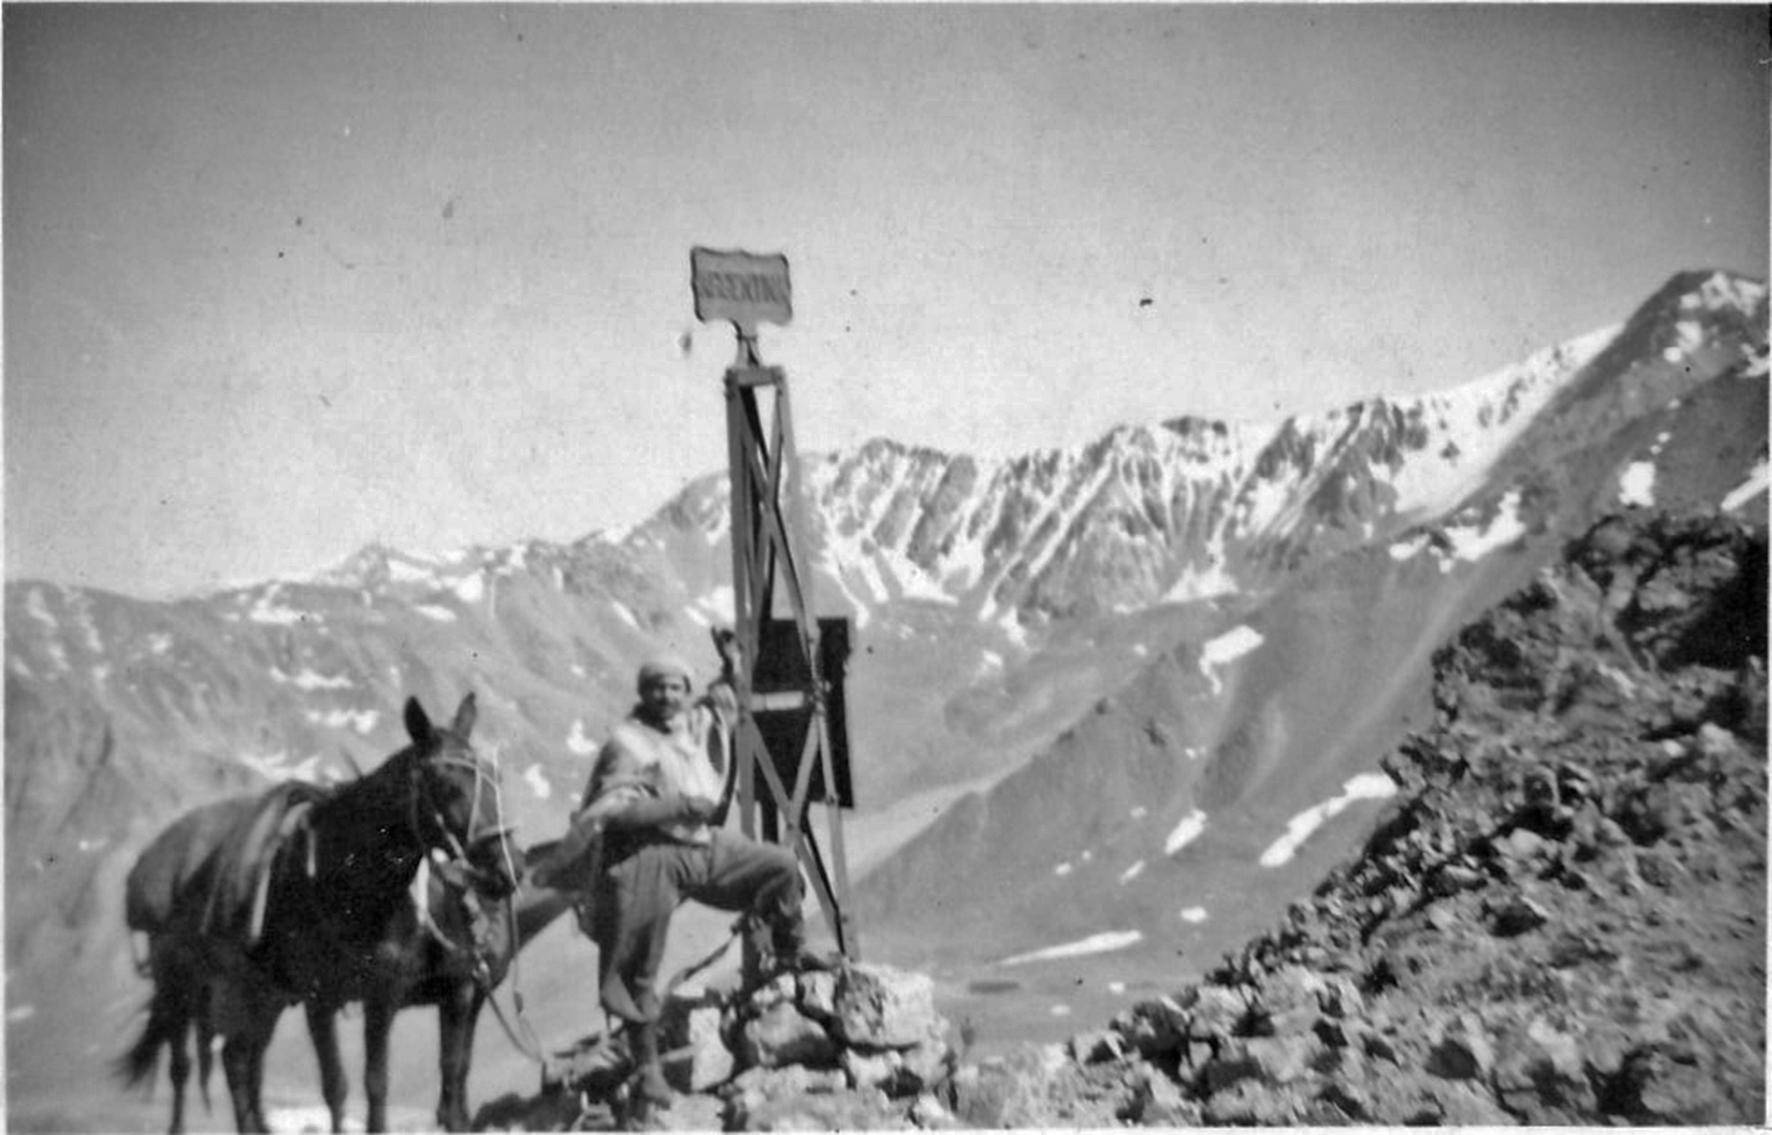 Enterreno - Fotos históricas de chile - fotos antiguas de Chile - Paso de Guana en 1943